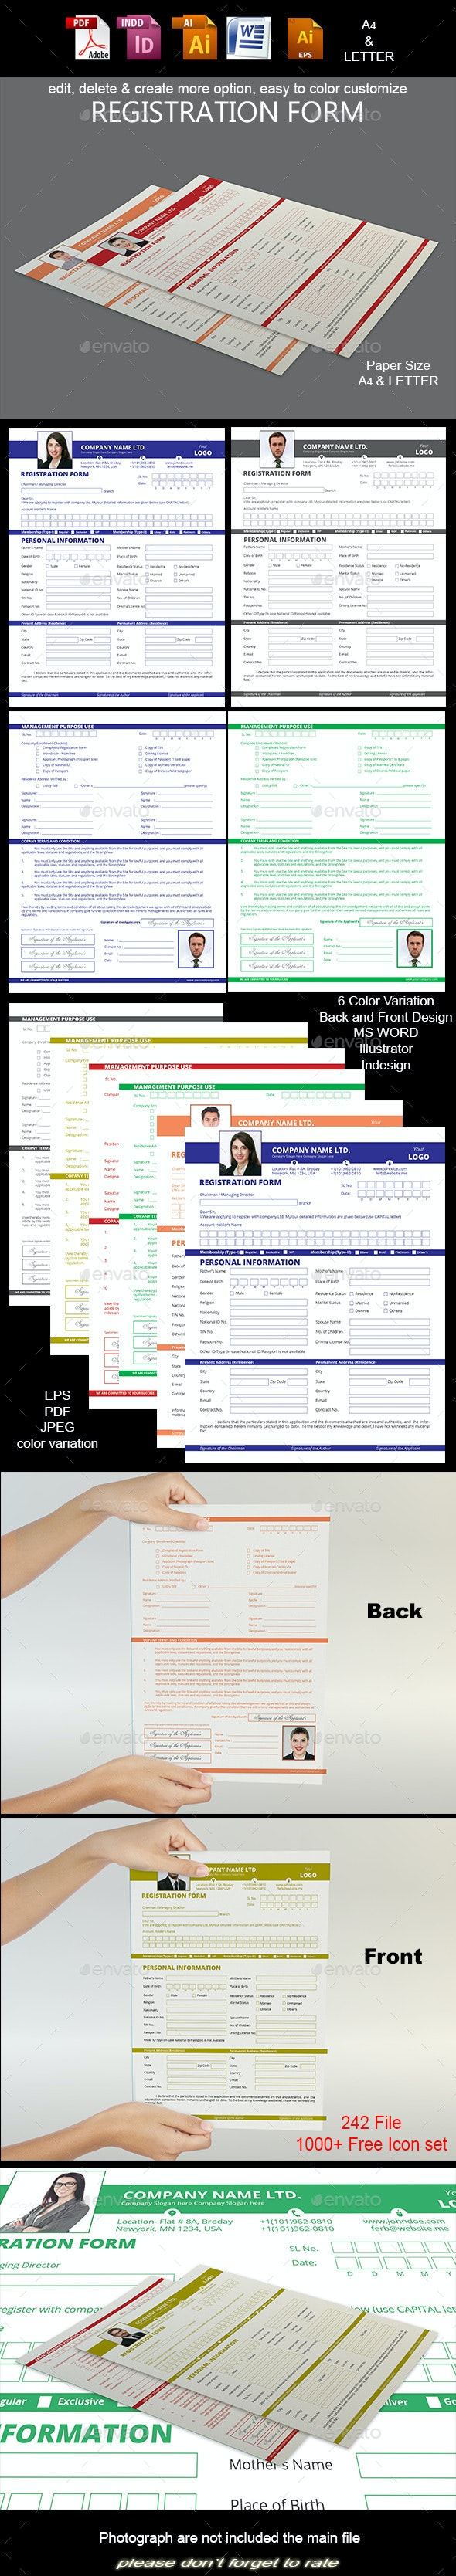 Registration Form - Print Templates